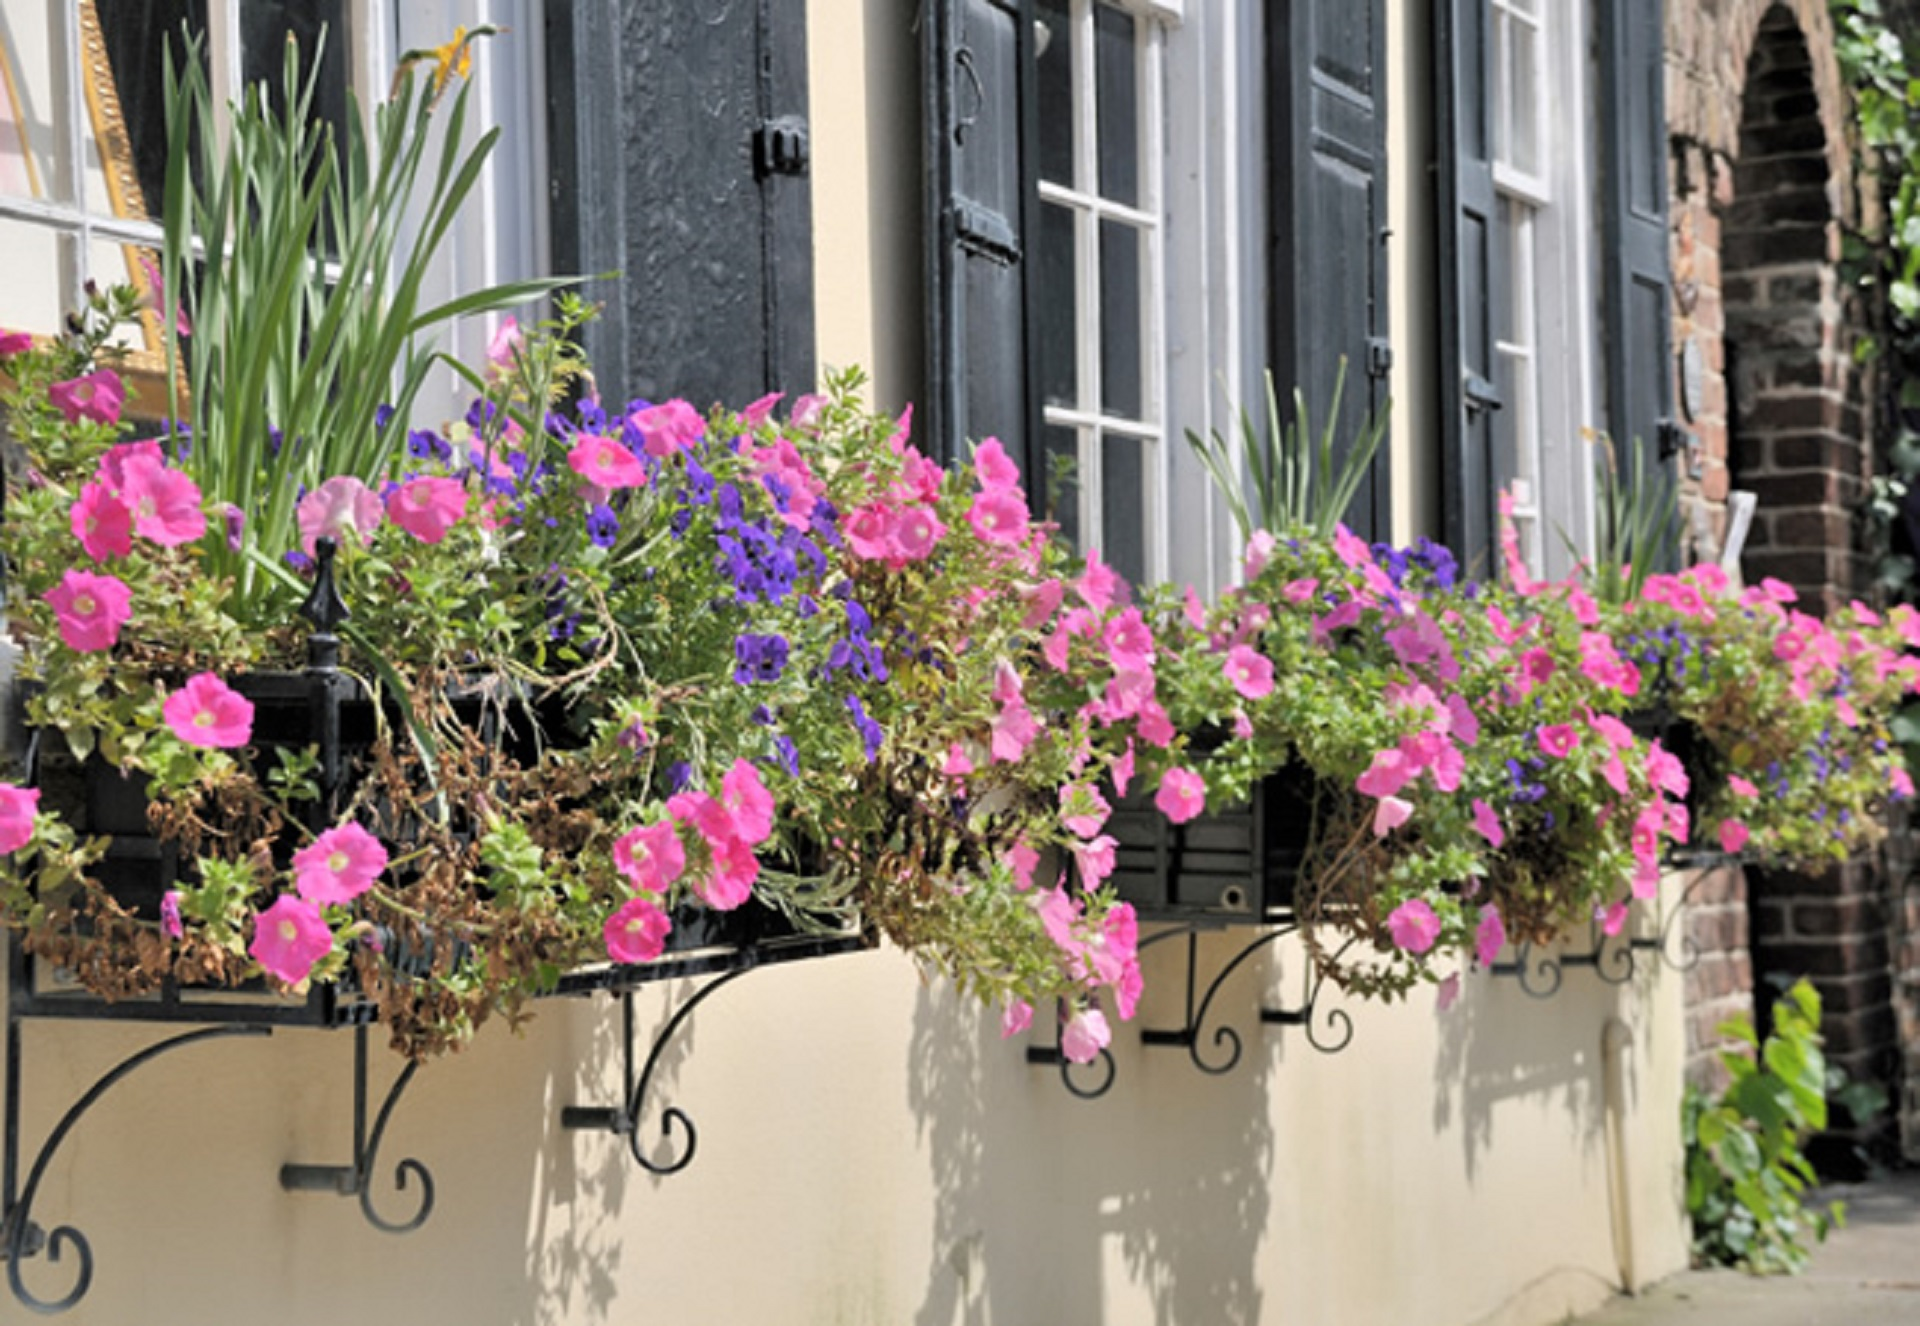 FlowersWindowBoxesCharleston.jpg